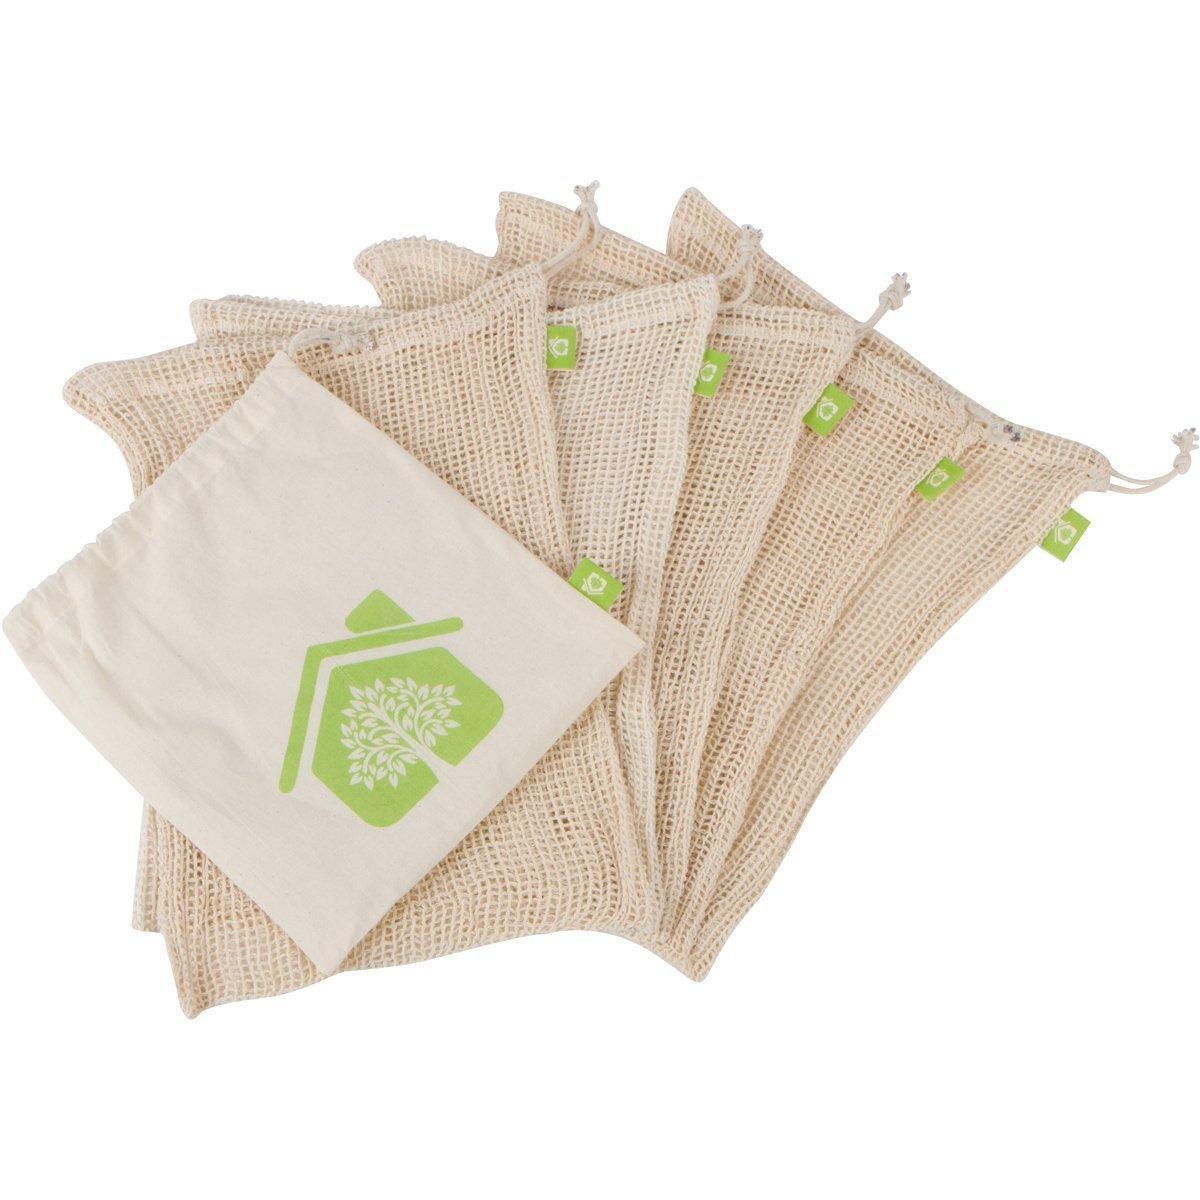 Reusable Produce Bags – Organic Cotton Mesh bags 1